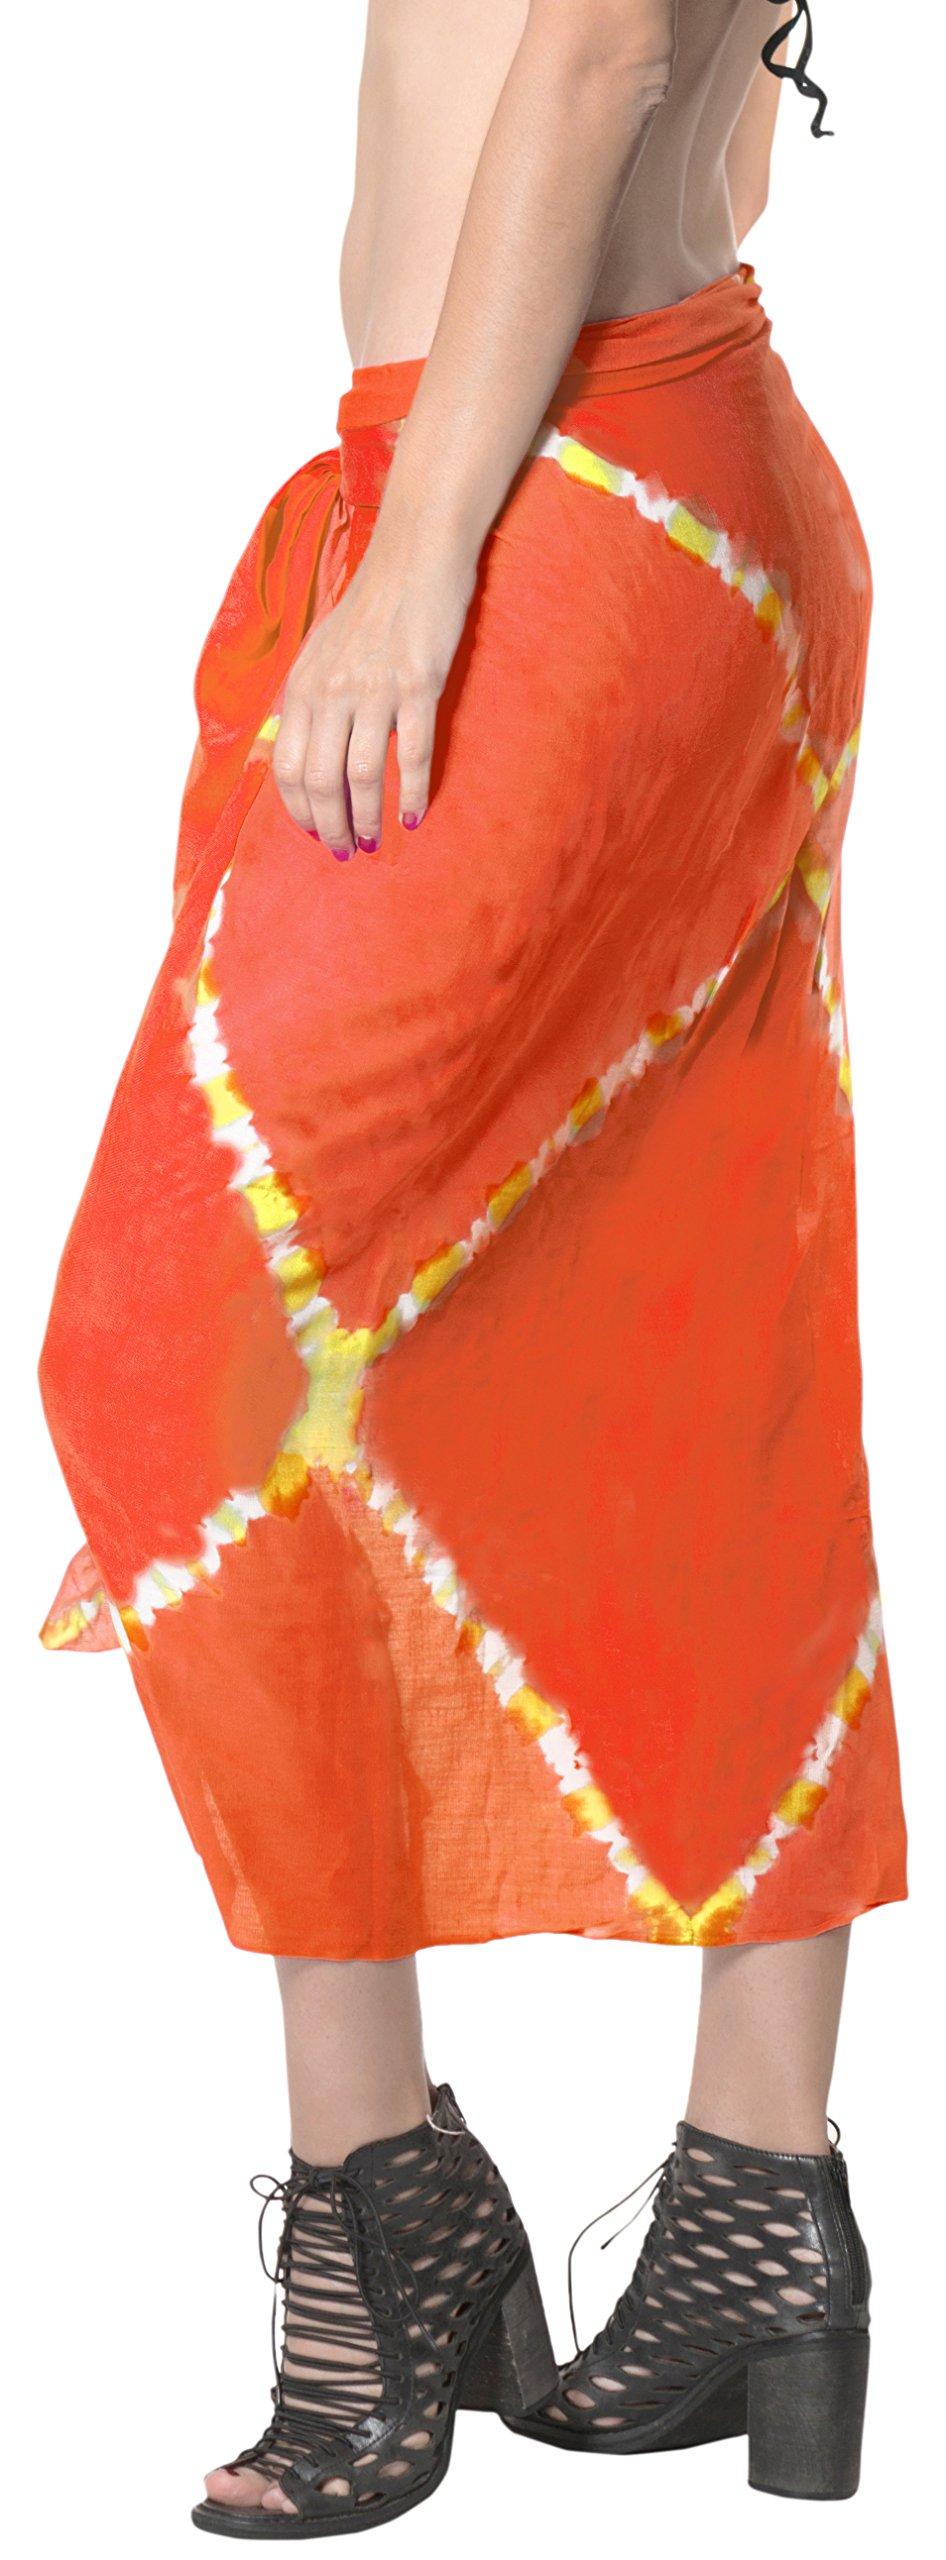 LA LEELA Rayon Costumi da Bagno Involucro Pareo Avvolgere Lungo Sarong Tie Dye 5 spesavip